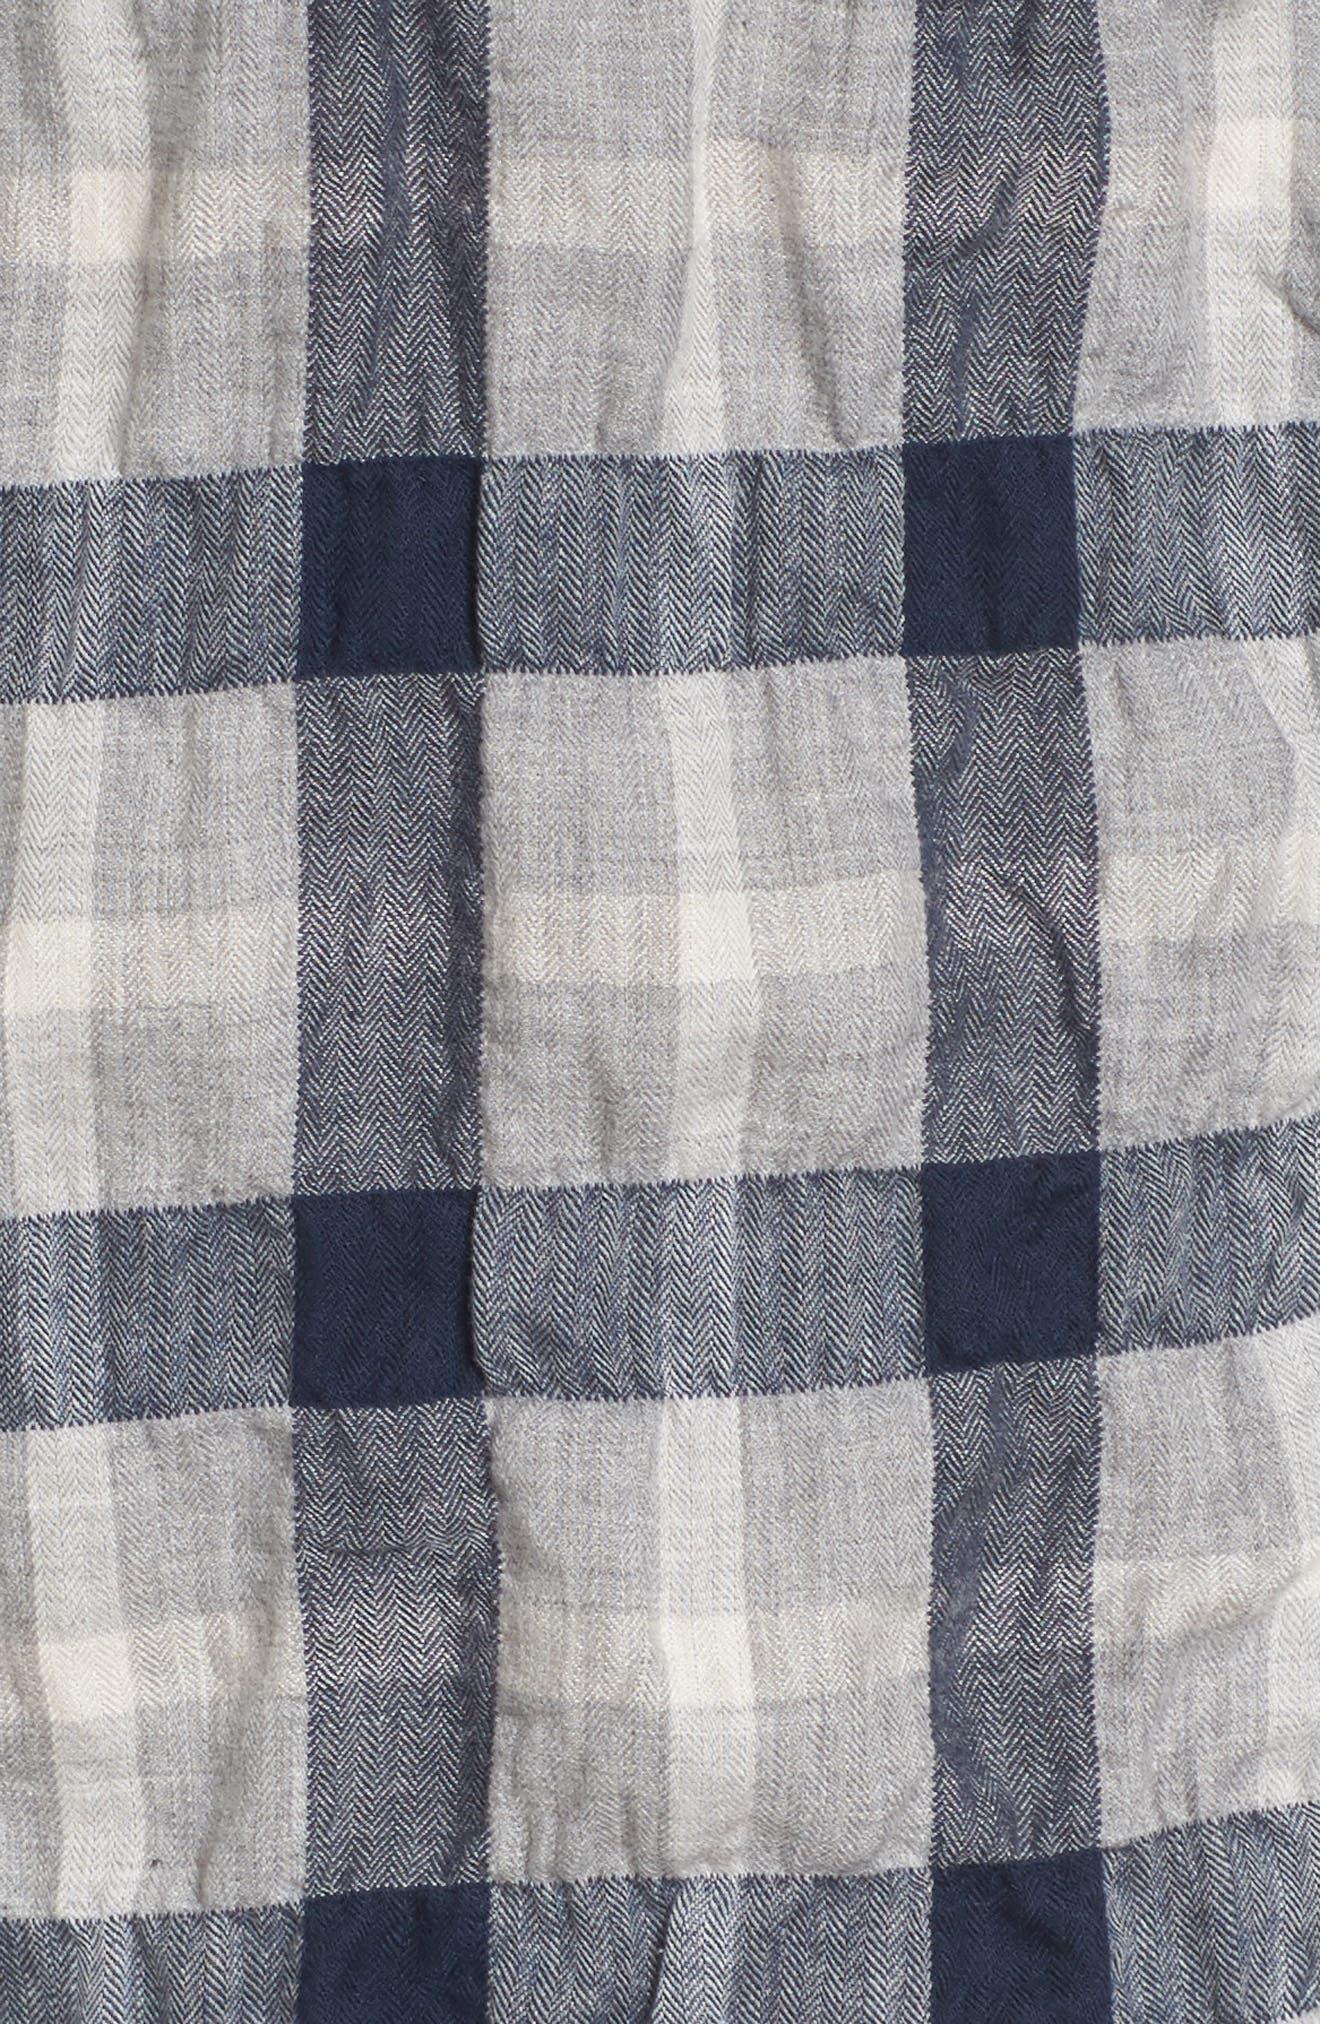 Truman Plaid Sport Shirt,                             Alternate thumbnail 5, color,                             Gray/ Navy/ White